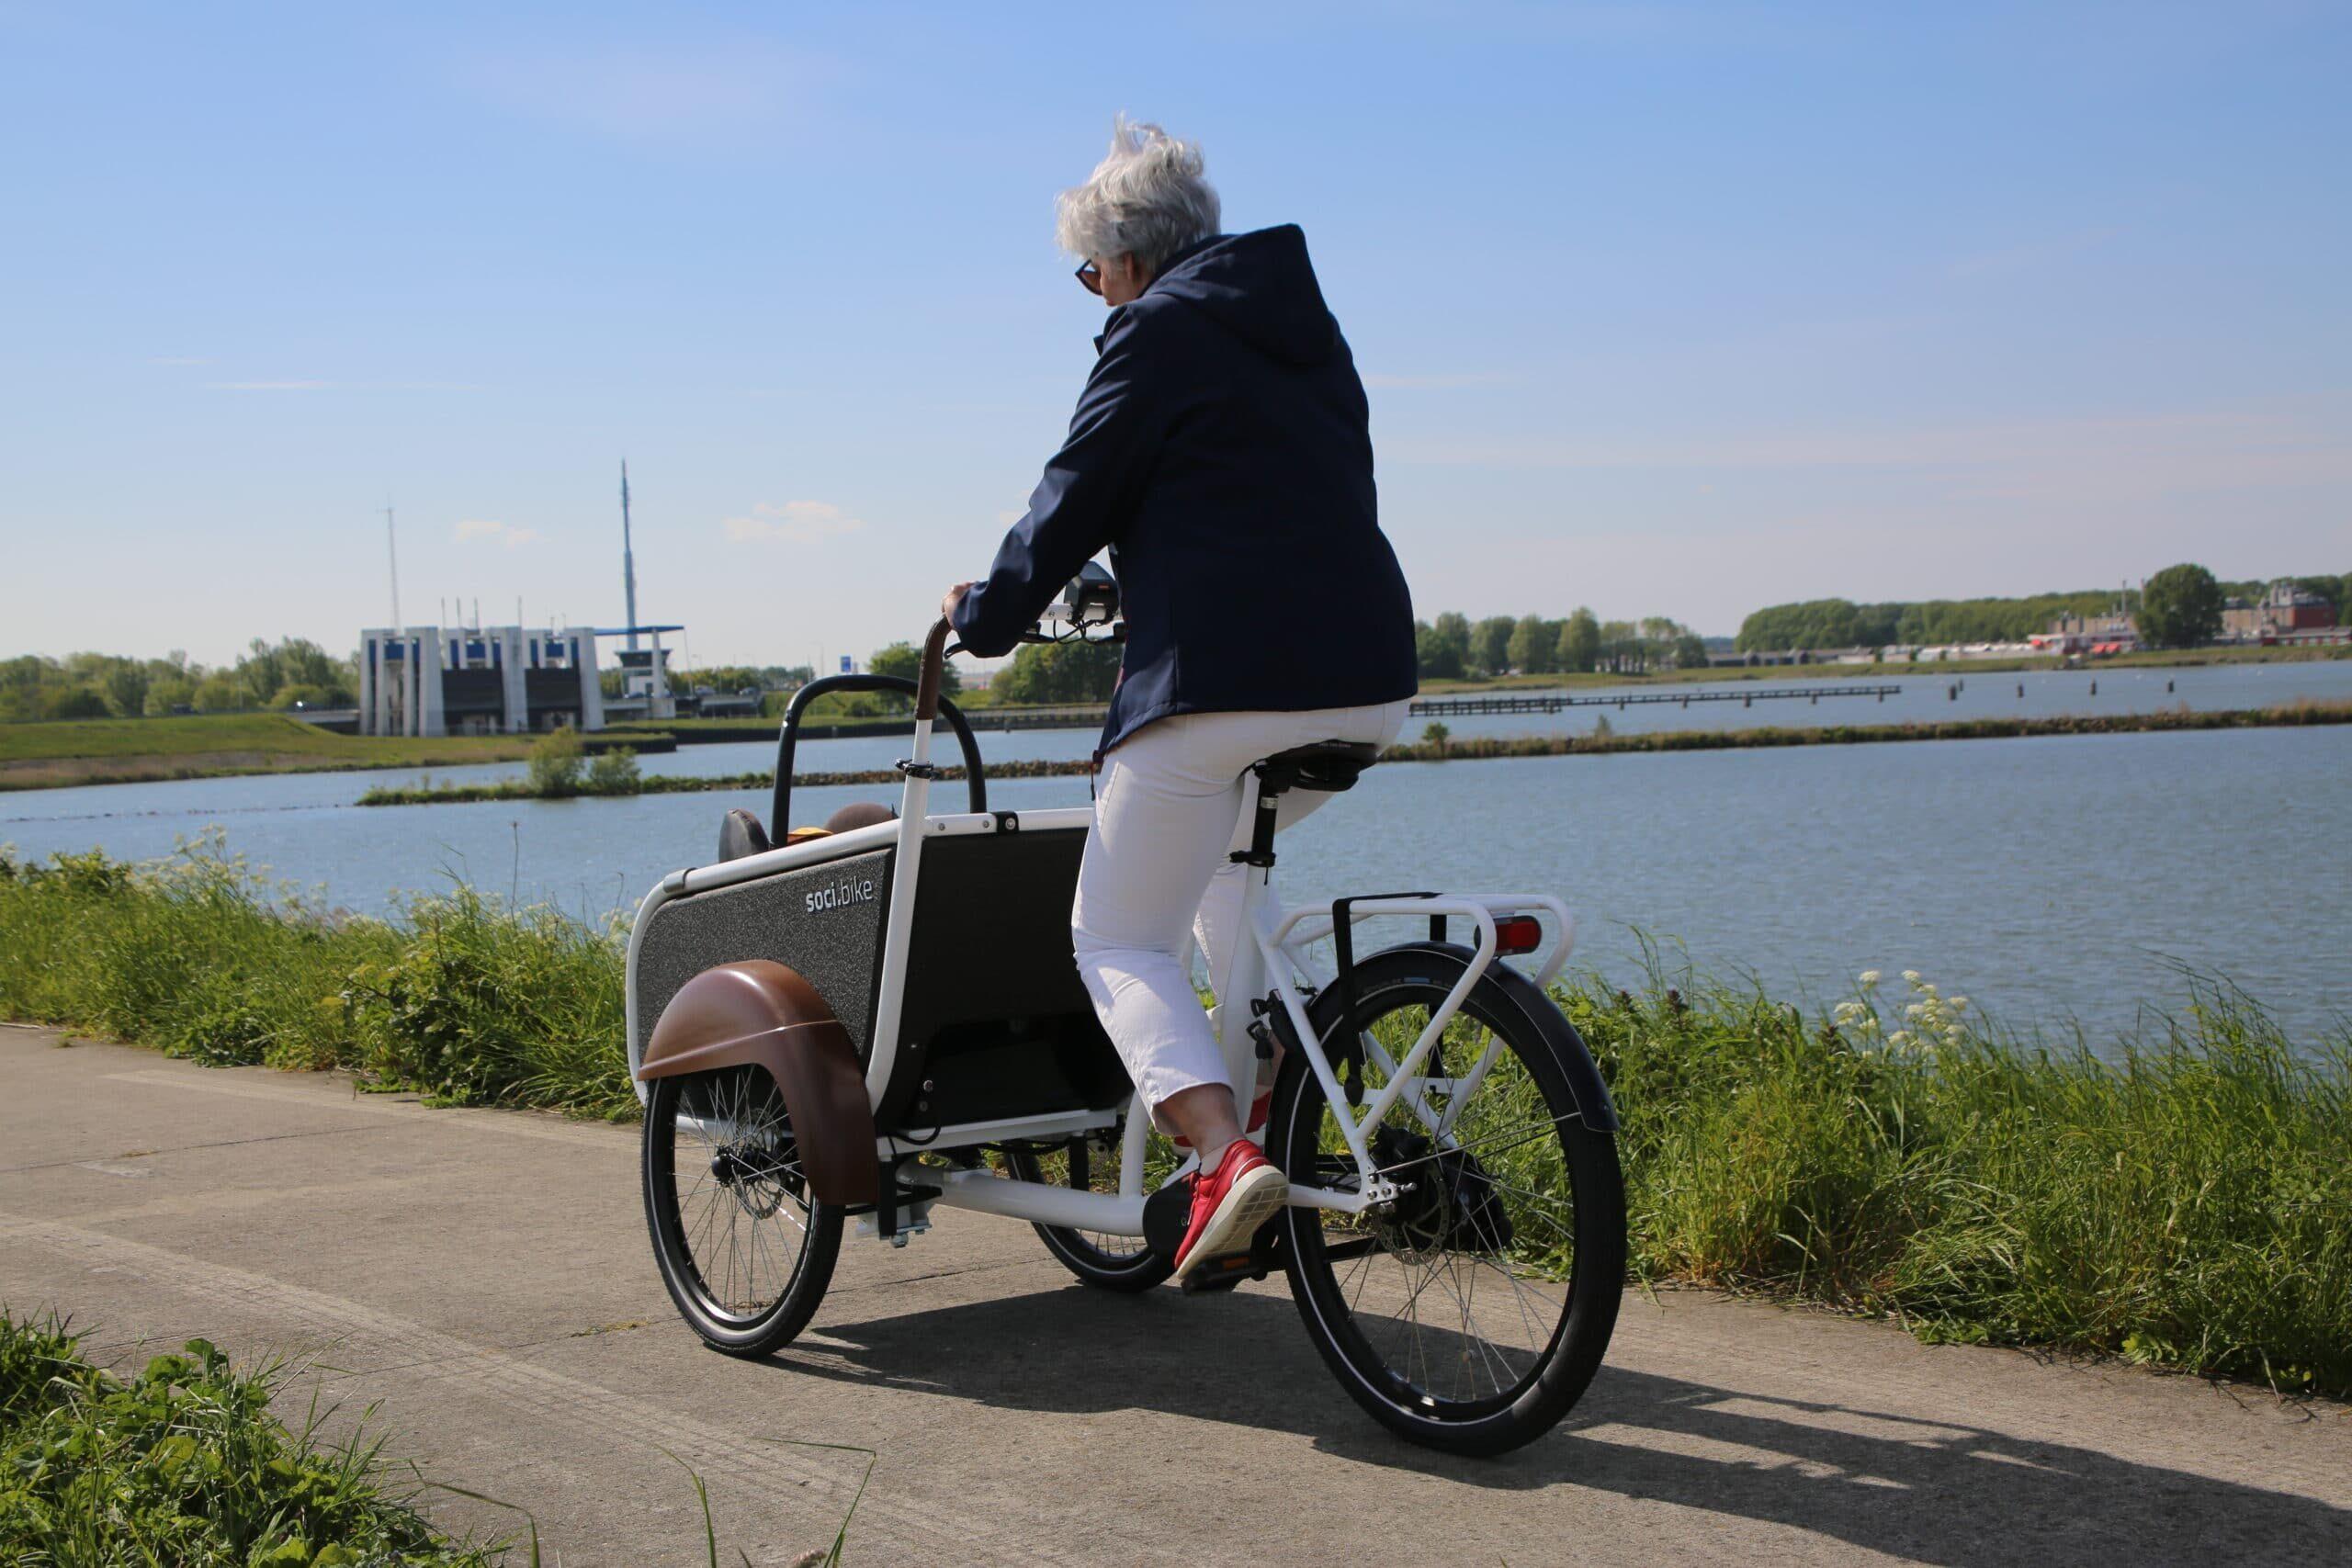 Een stabiele én hippe fiets